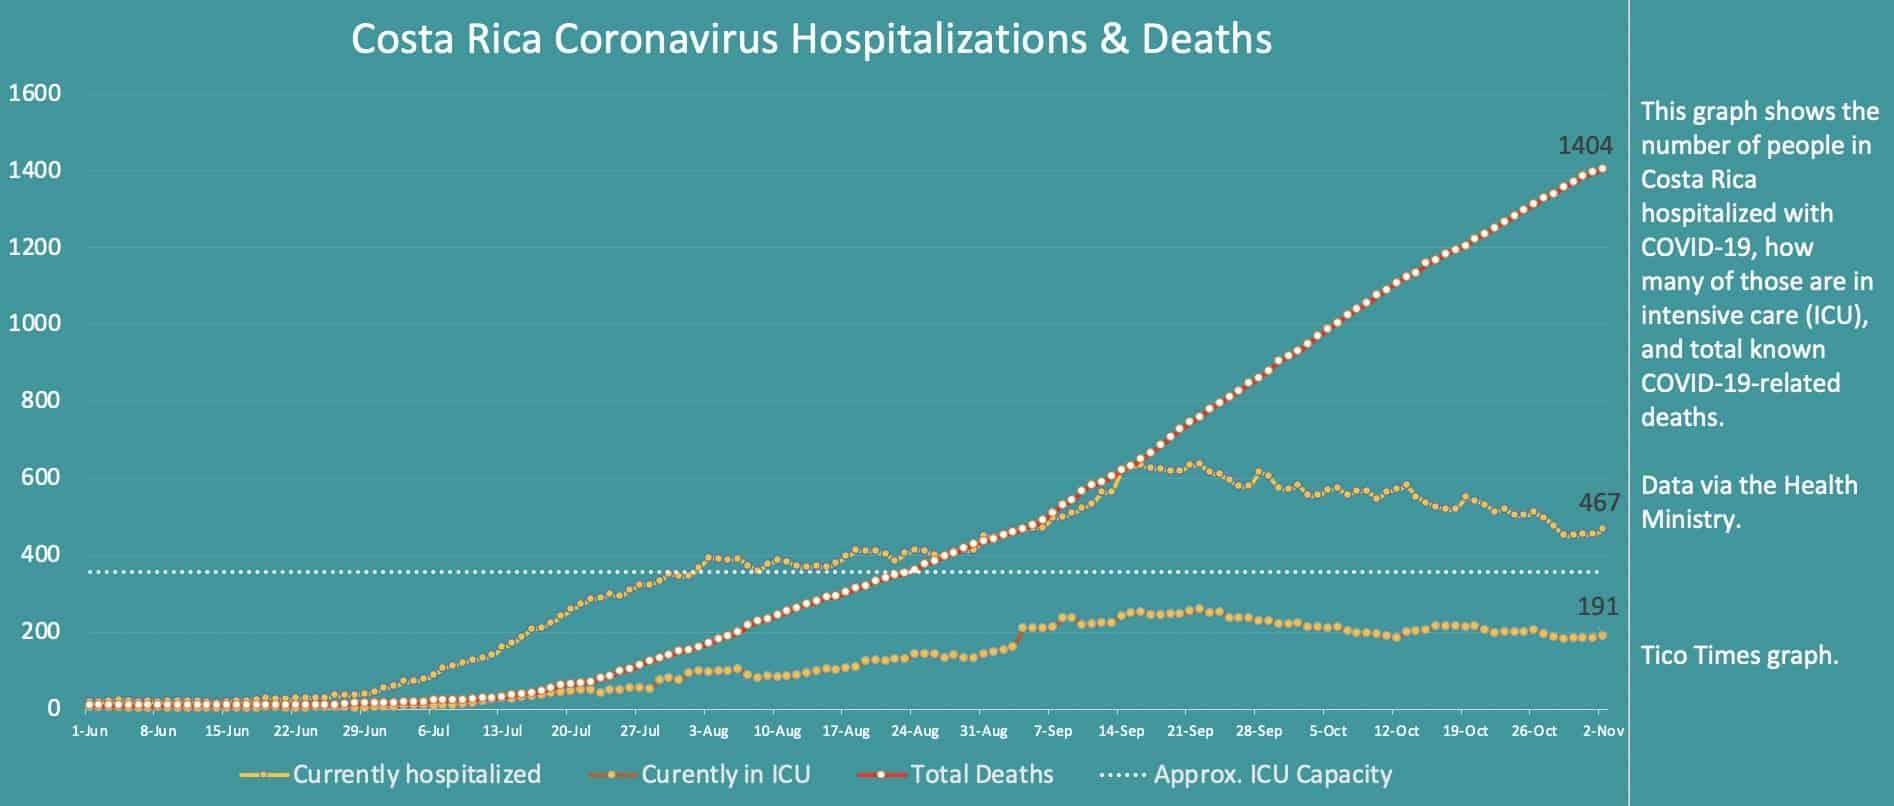 Costa Rica coronavirus hospitalizations and deaths on November 2, 2020